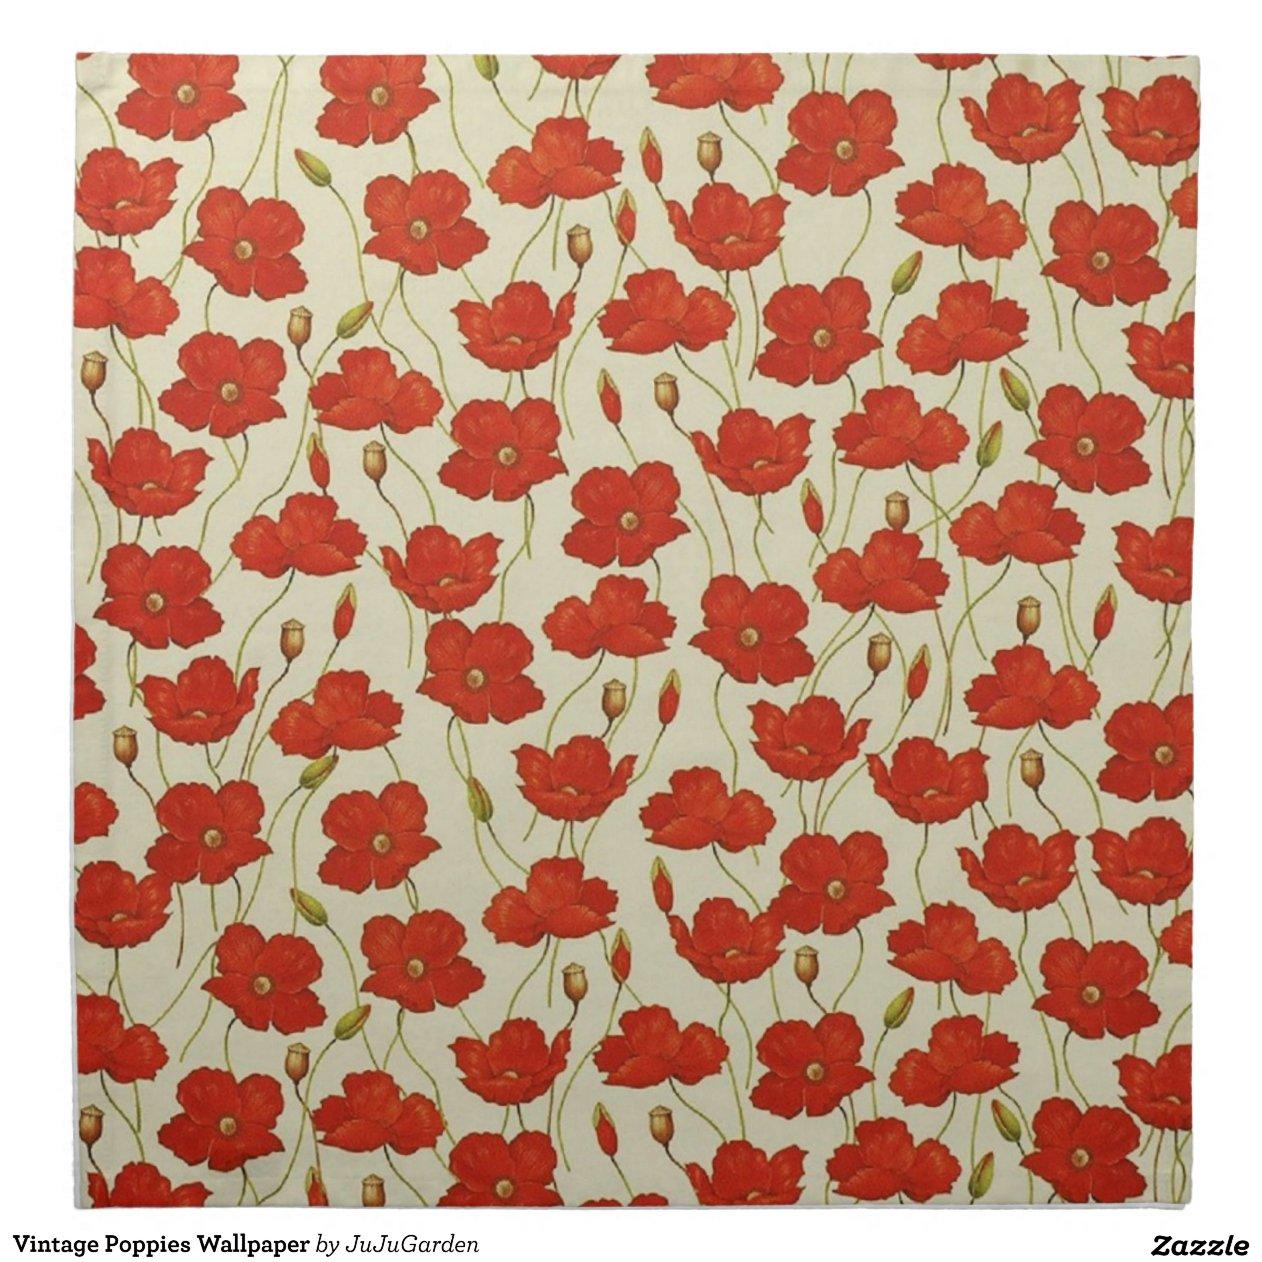 Individuell Bedruckte Tapete : Vintage Mohnblumen-Tapete Bedruckte Serviette Zazzle